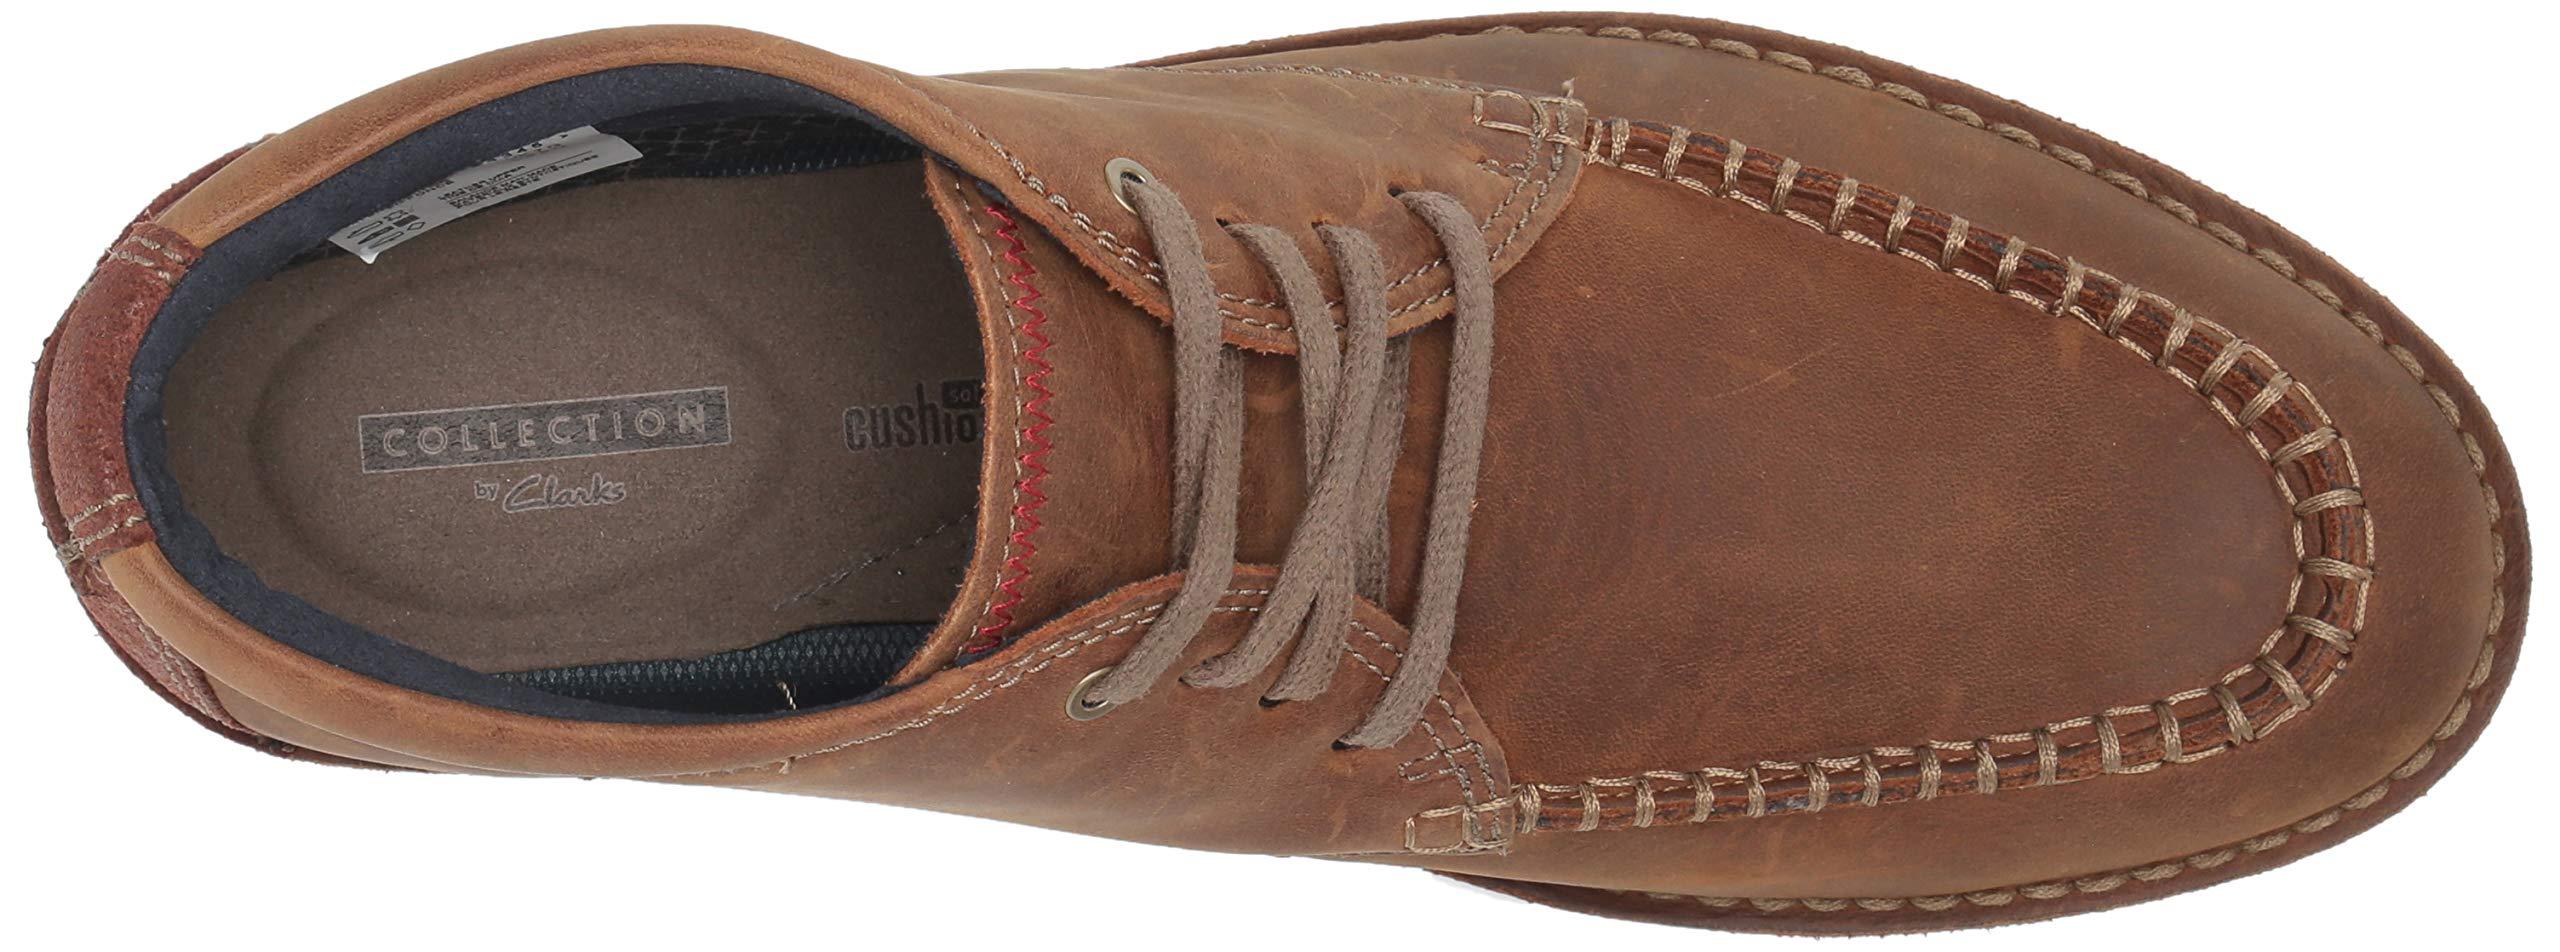 Clarks Men's Vargo Apron Ankle Boot 8